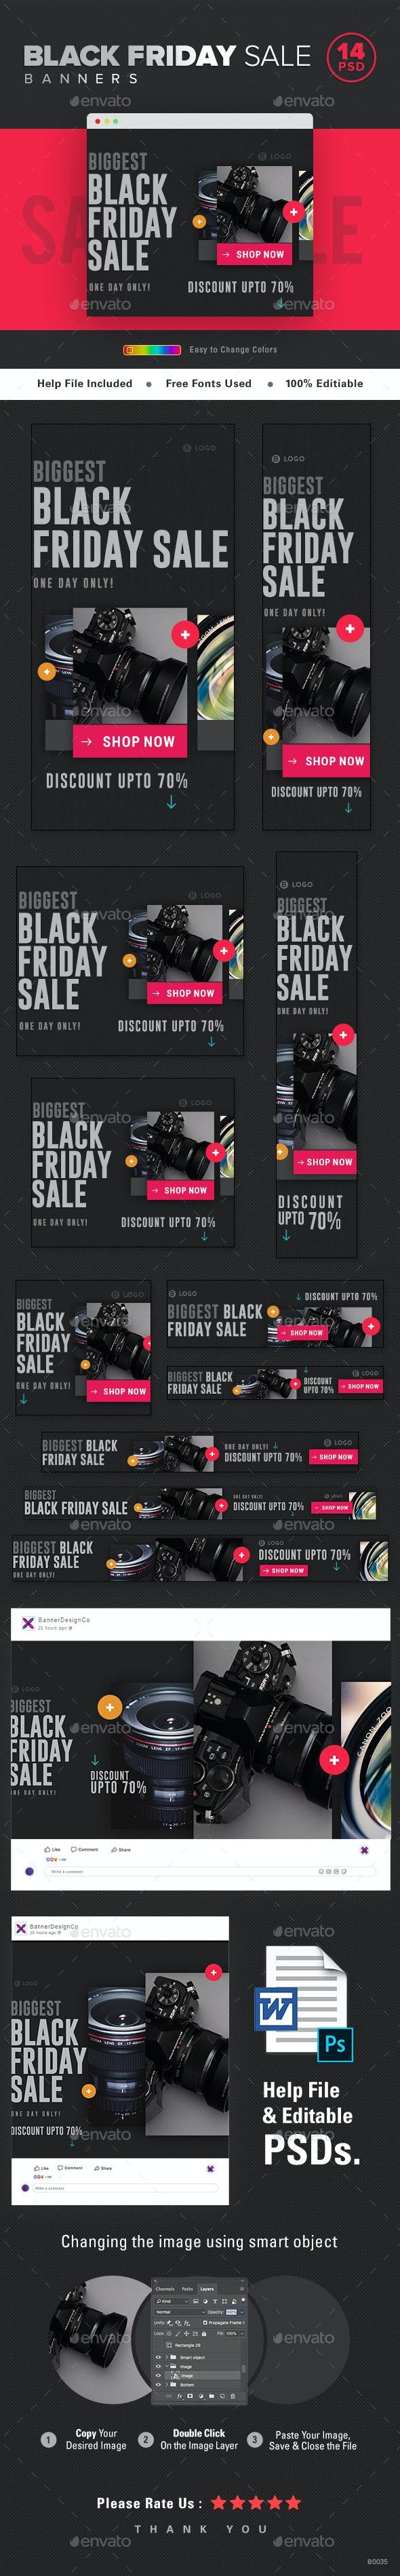 Black Friday Sale Web Banner Set - Banners & Ads Web Elements